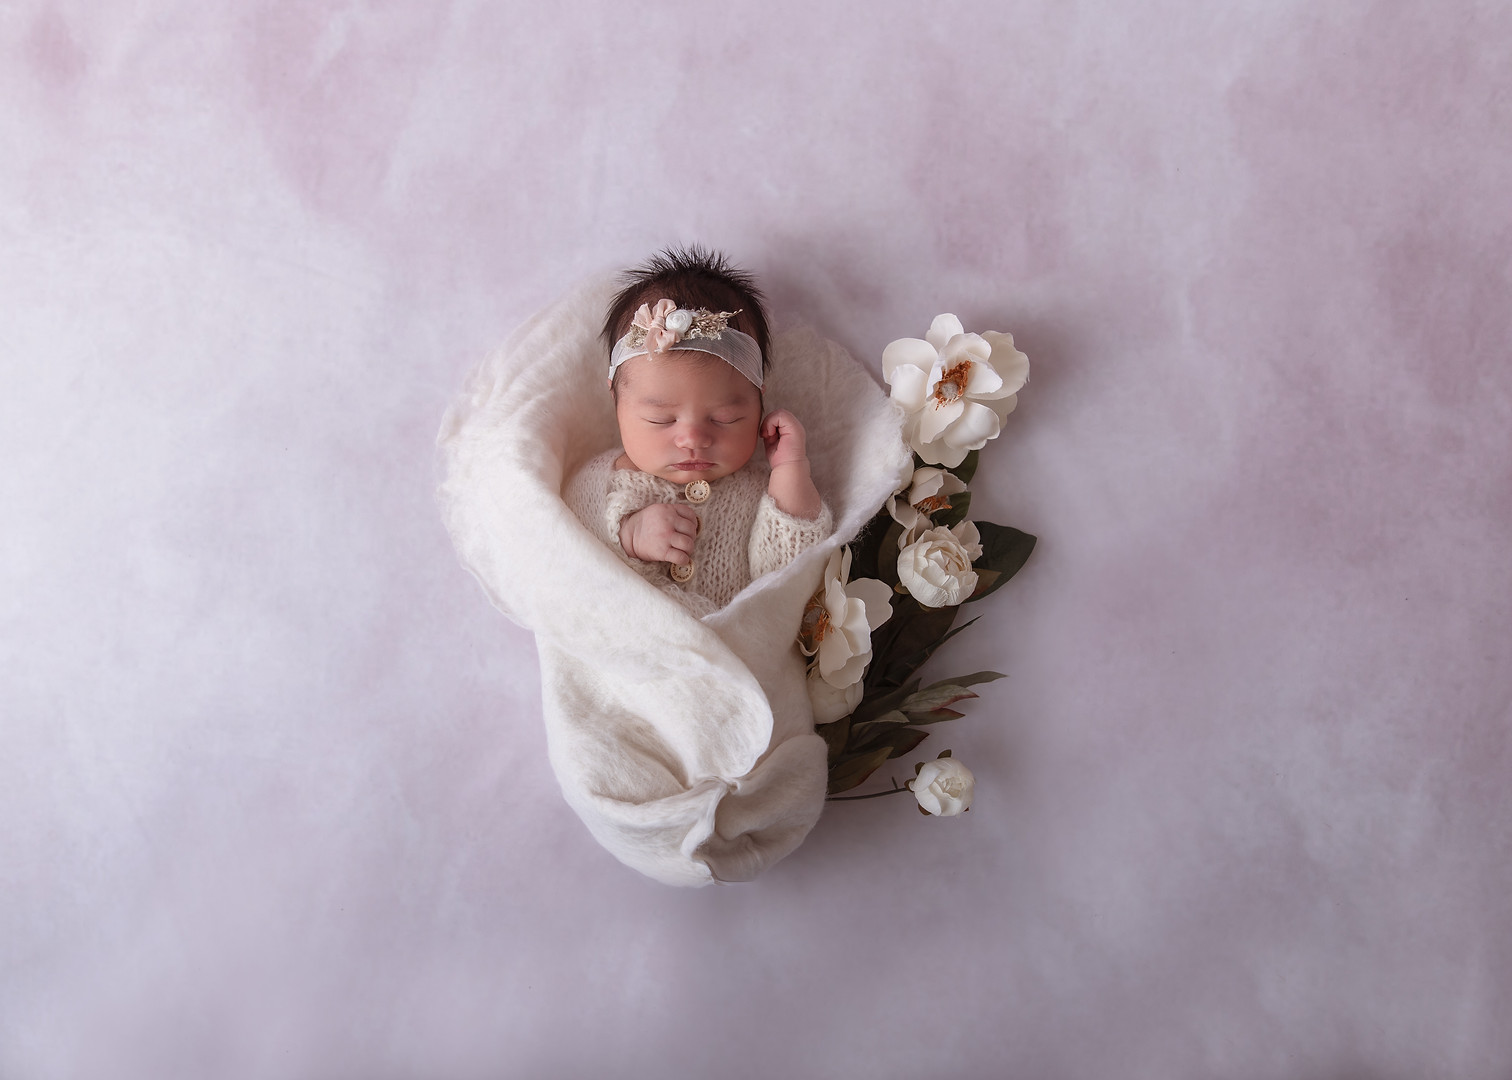 baby_girl_newborn_photography